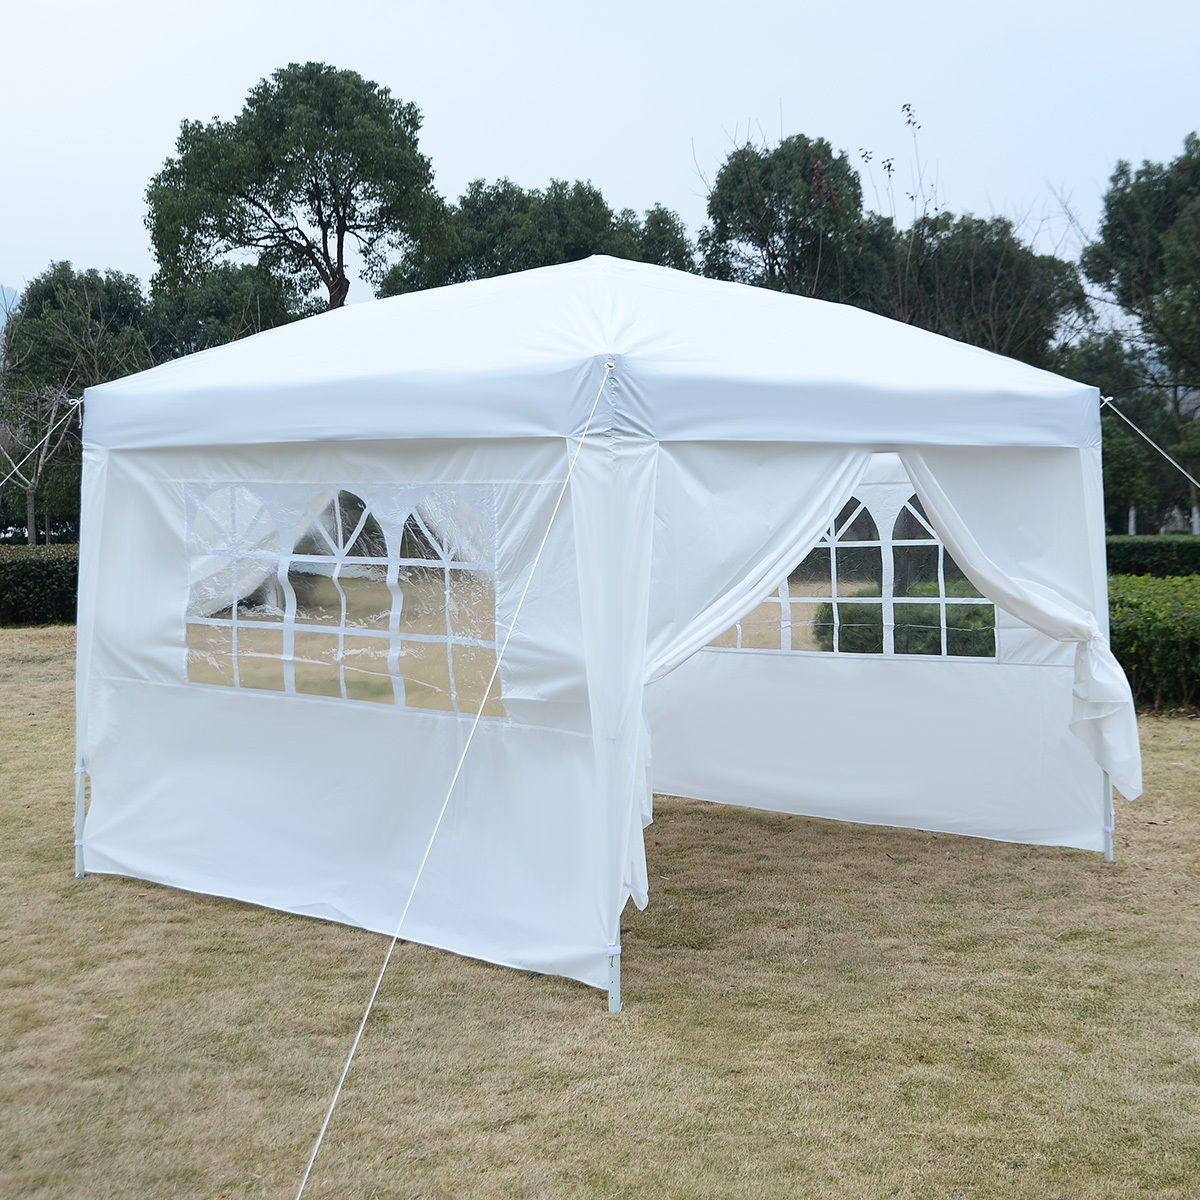 Apontus Outdoor Easy Pop Up Tent Cabana Canopy Gazebo with ...